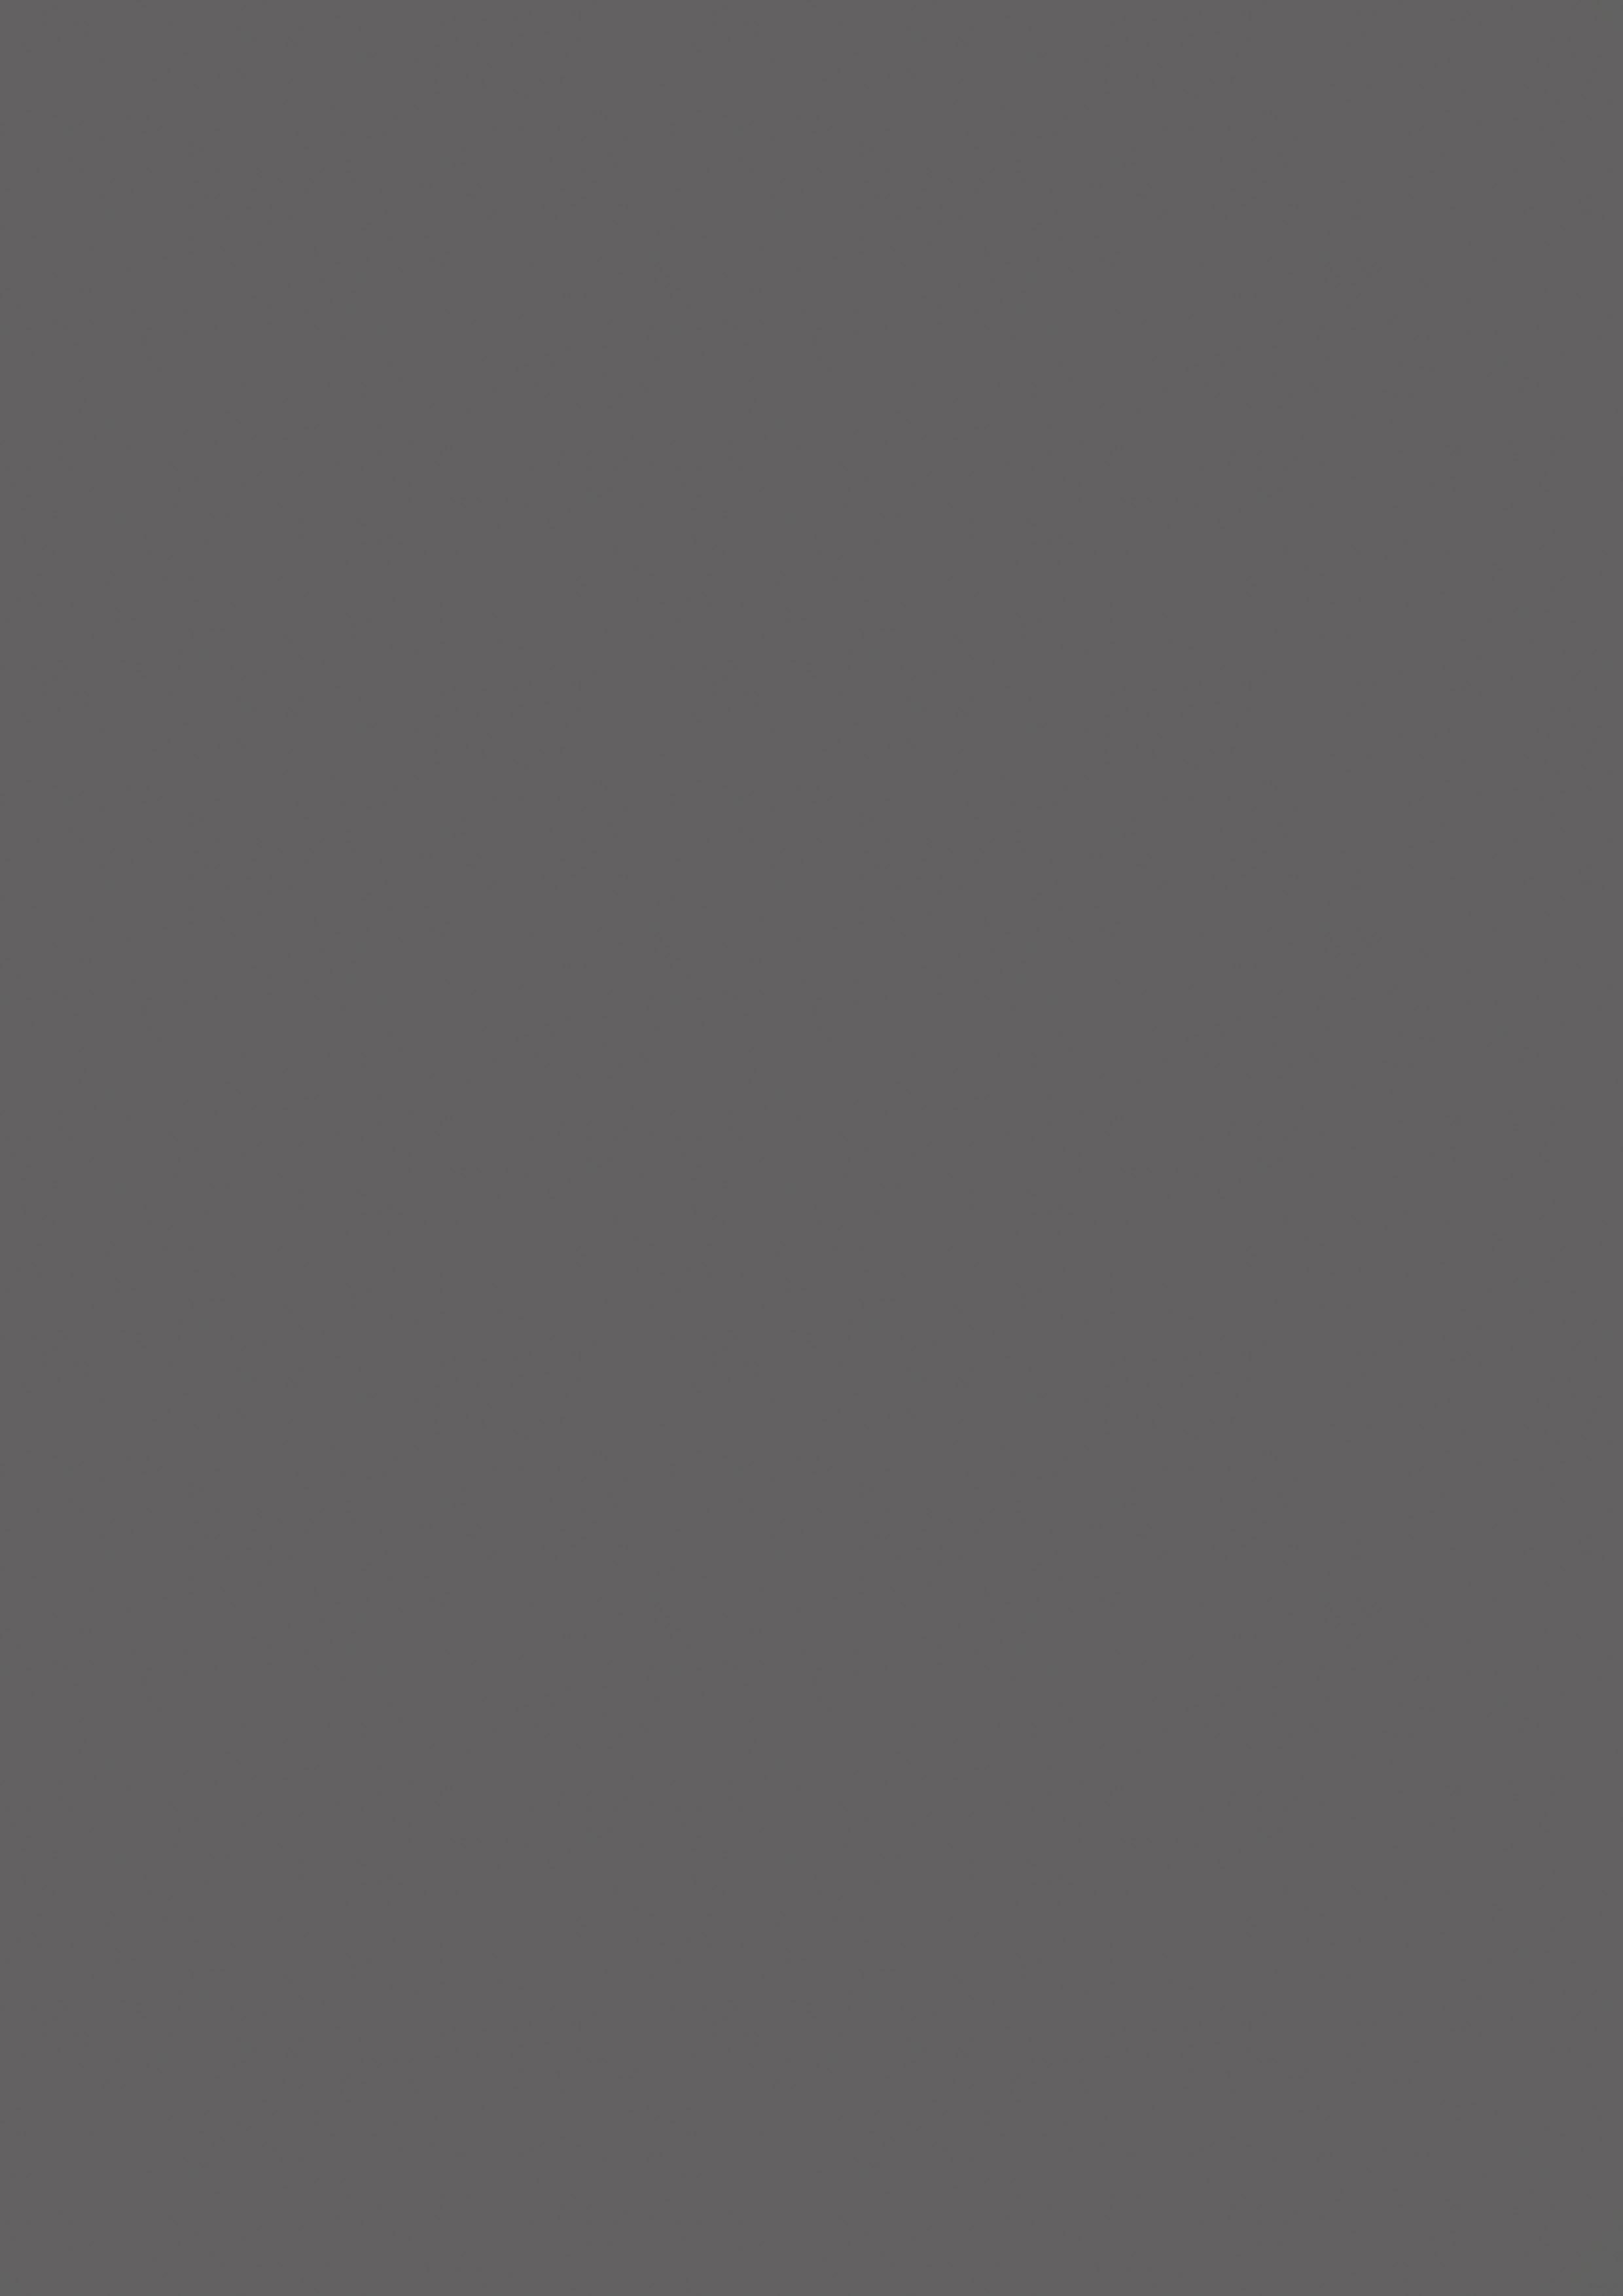 Antharcite (U1290LL)